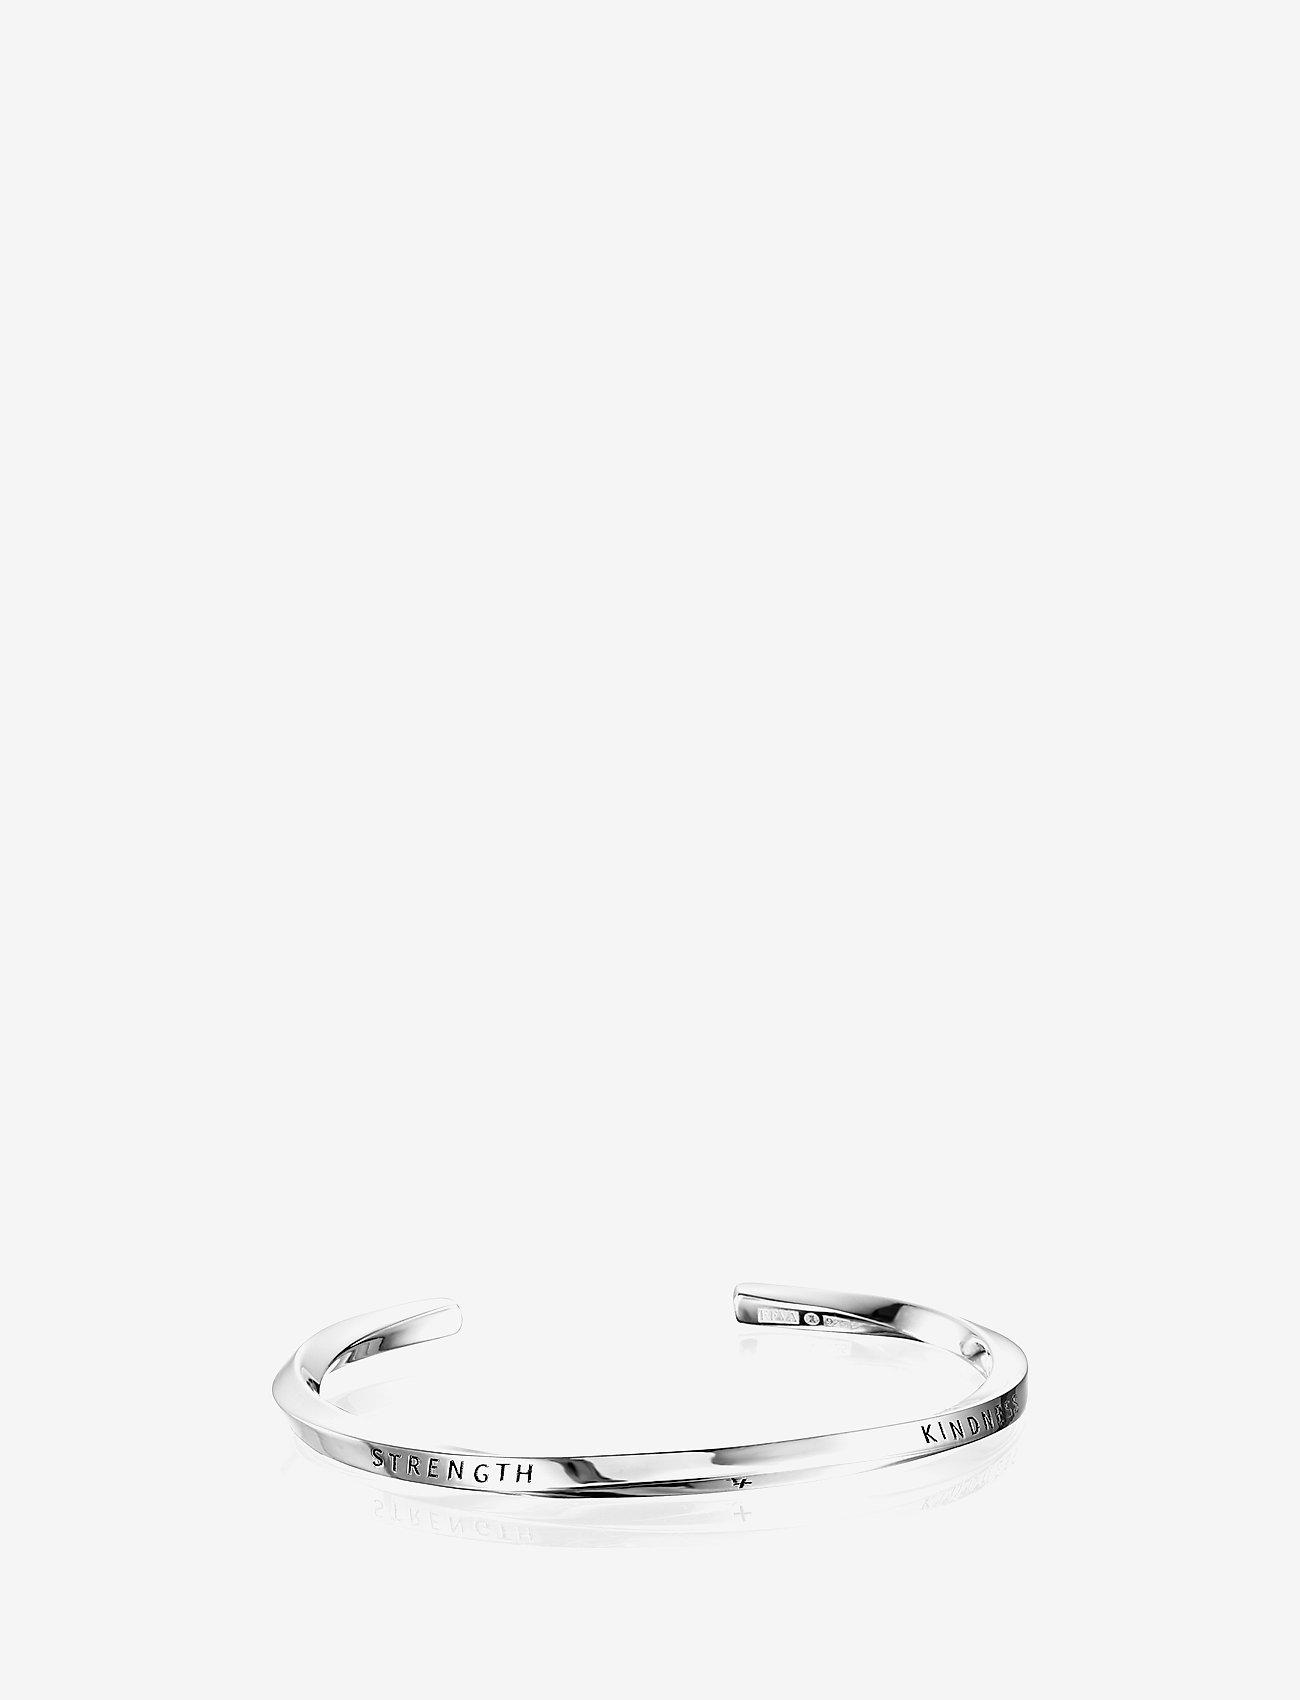 Efva Attling - Strength & Kindness Slim Cuff - bangles - silver - 0